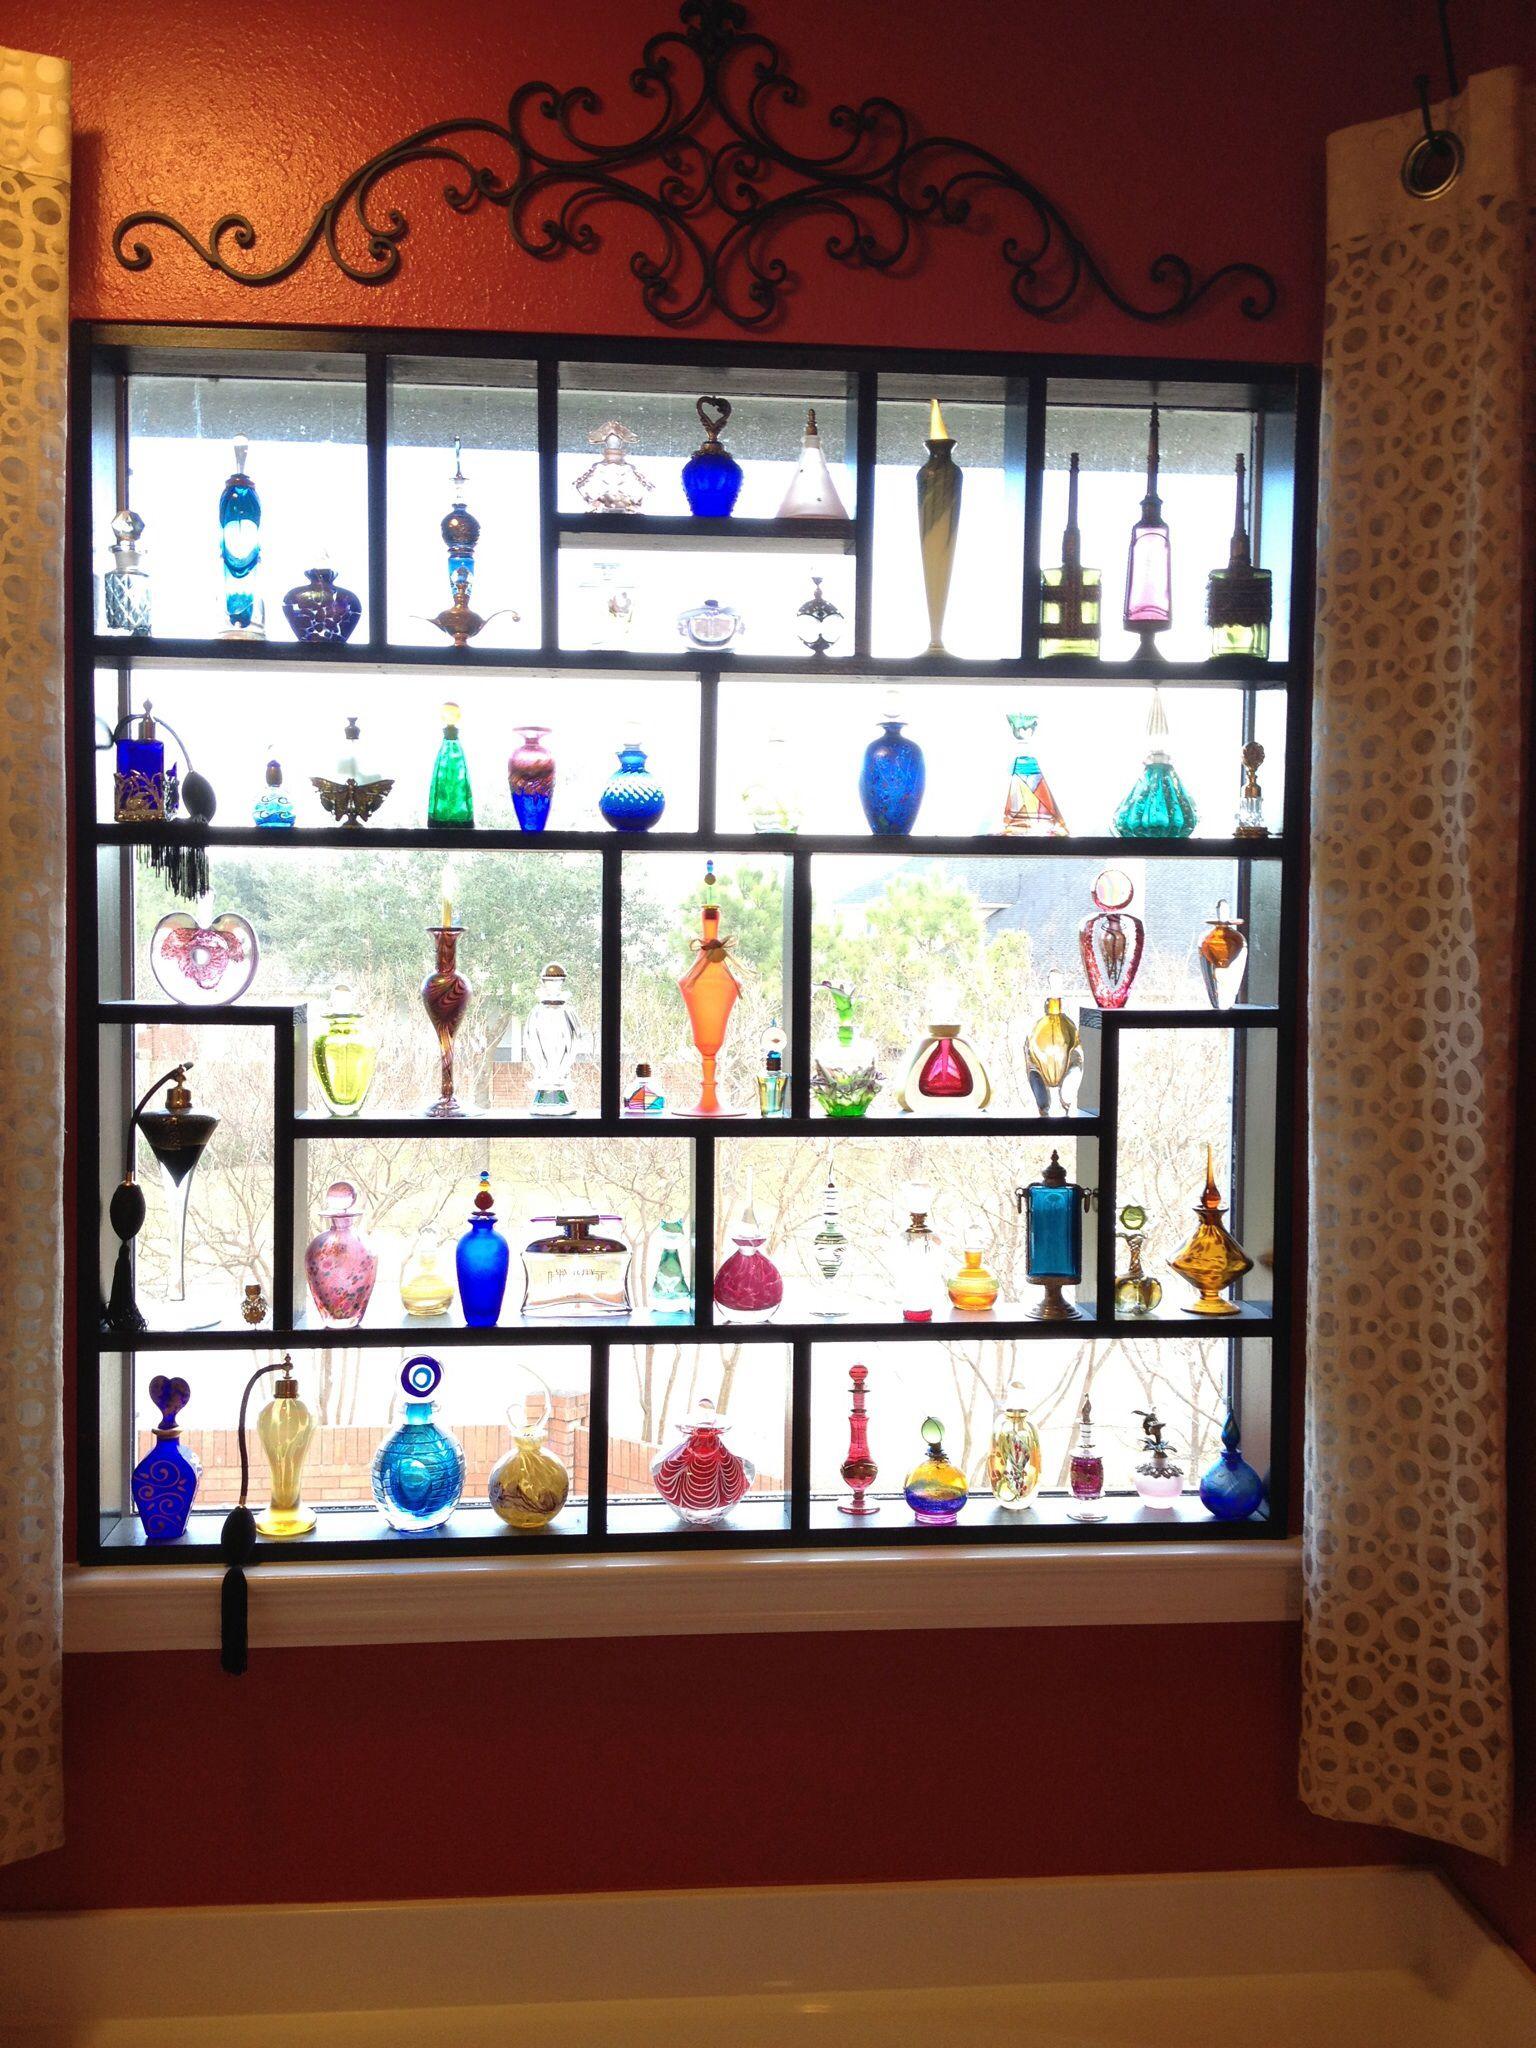 Perfume bottles display on window perfume bottles for Glass bottle display ideas